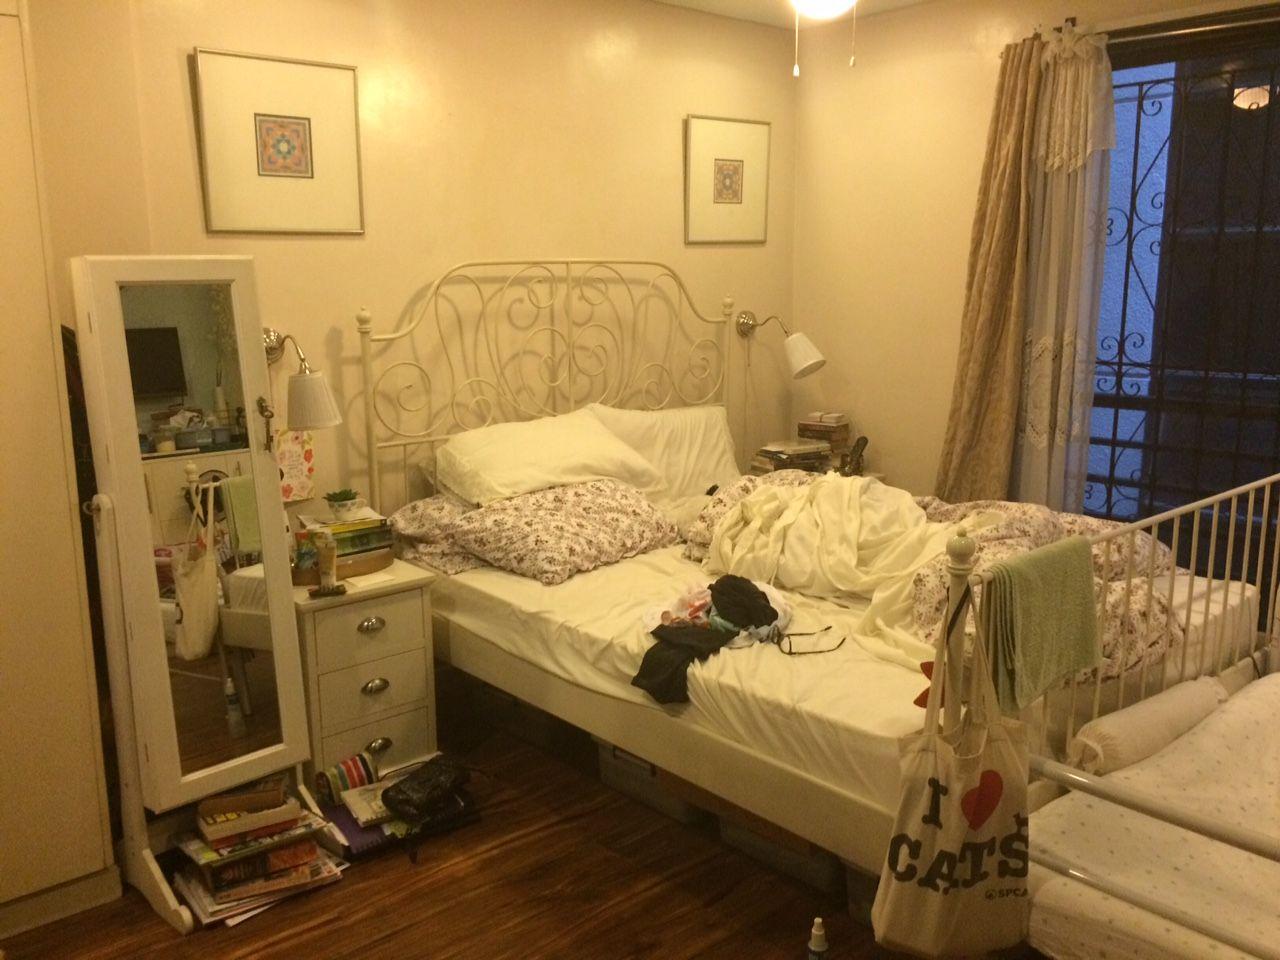 Messy Bedroom How To Fix Your Bedroom